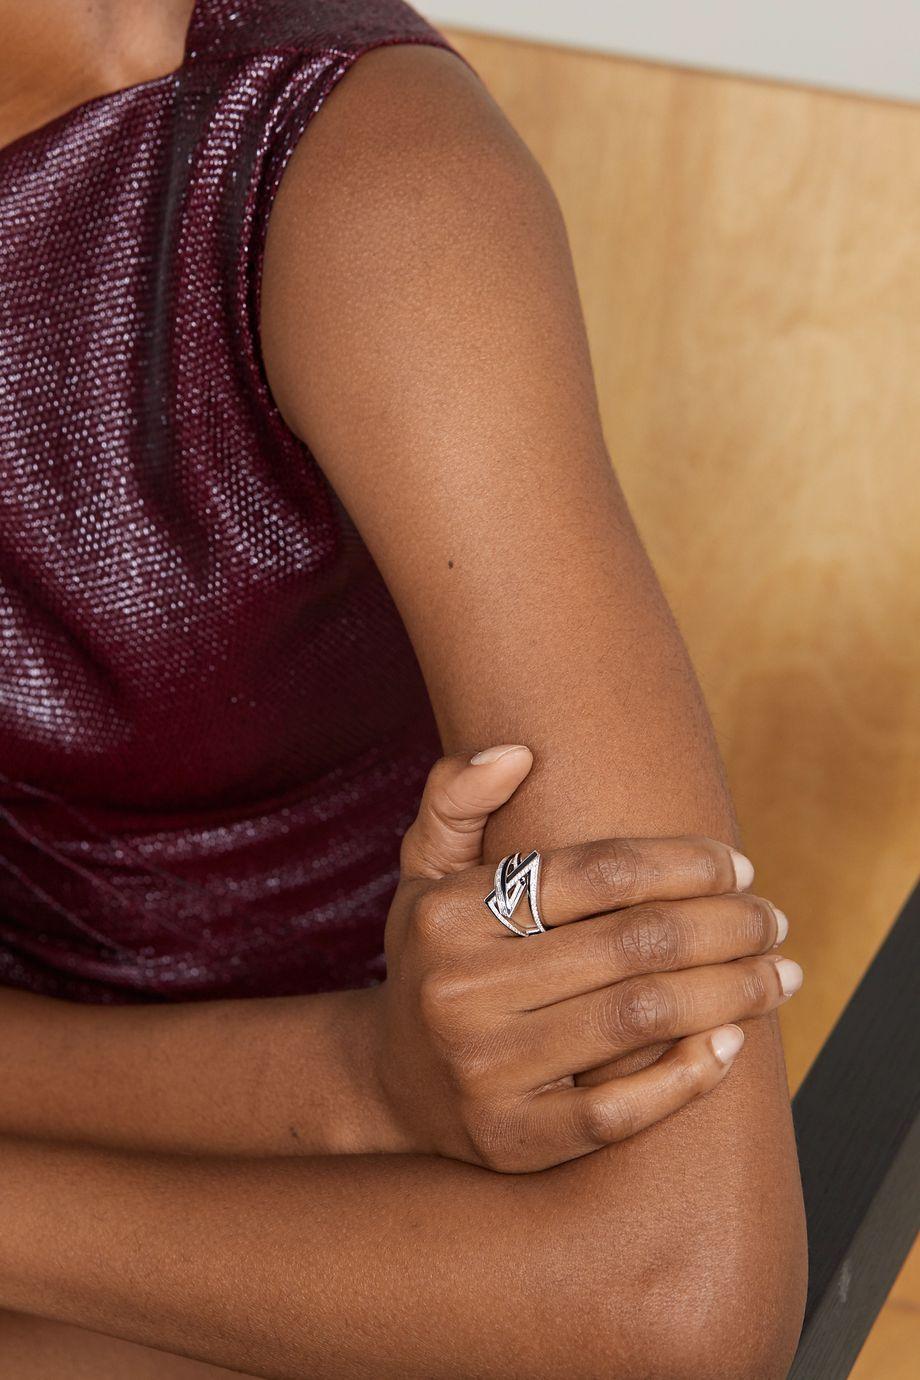 Stephen Webster Vertigo Obtuse 18-karat white gold, diamond and enamel ring